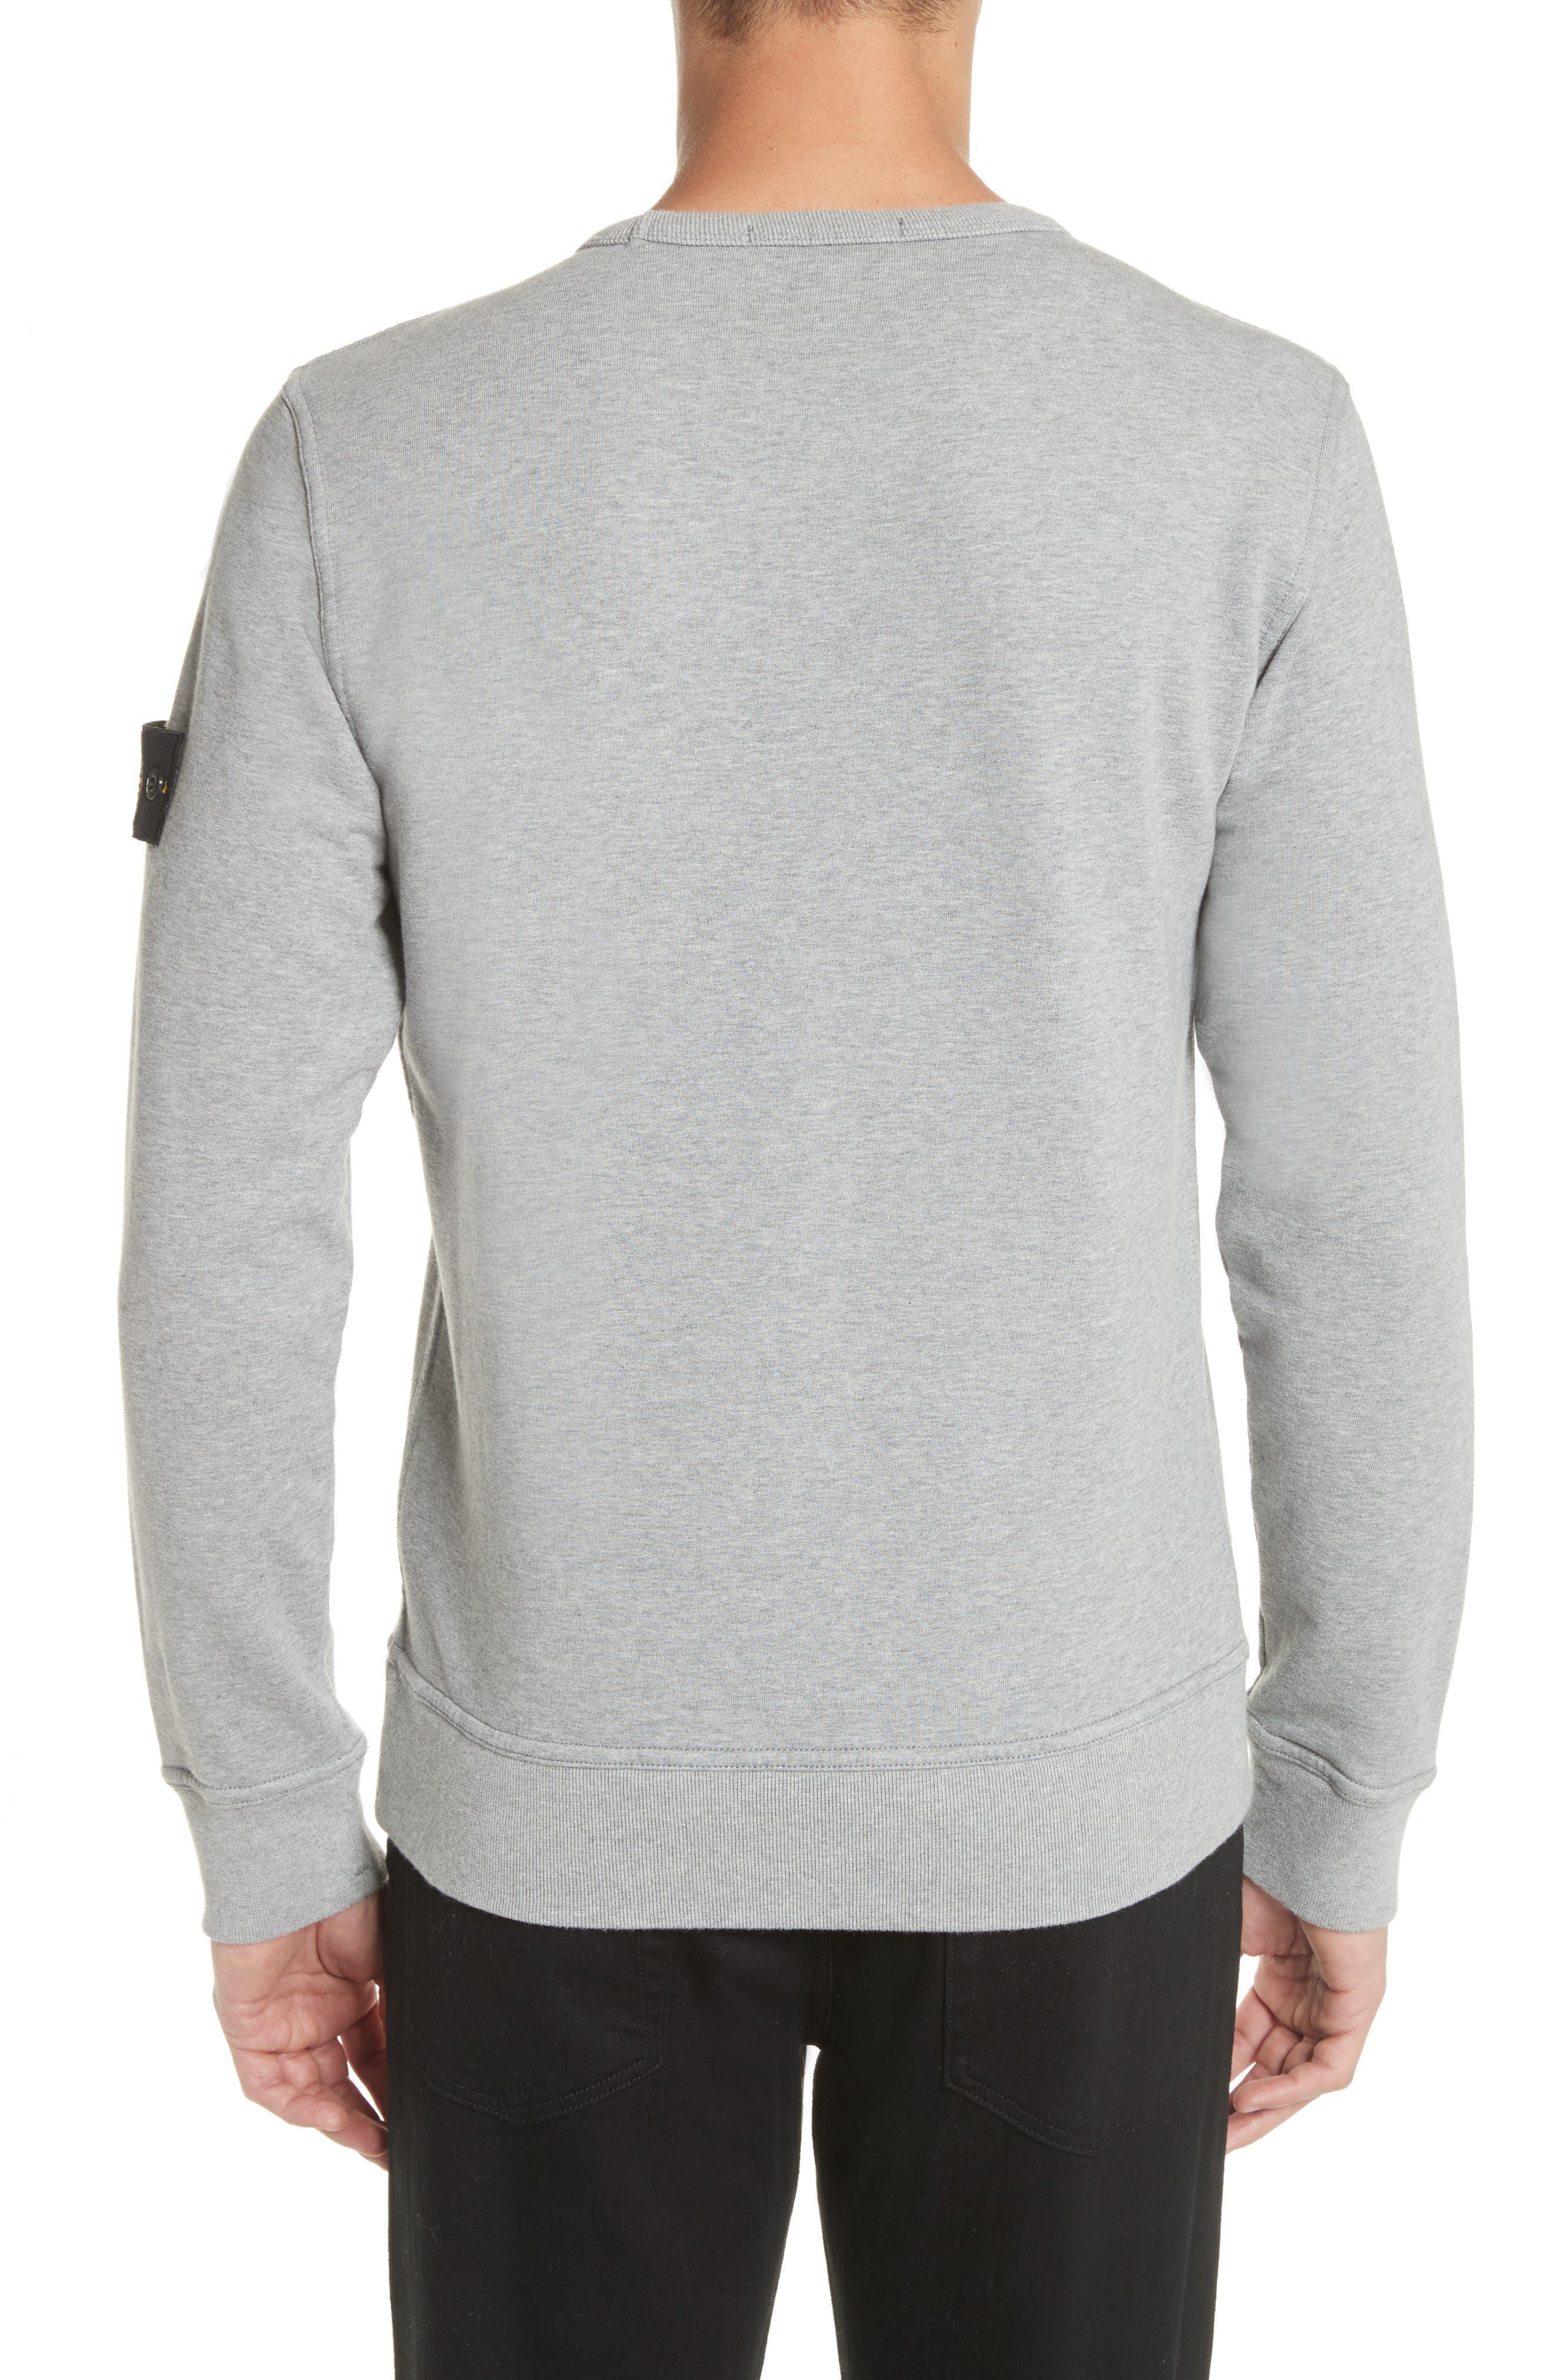 Pocket Sweatshirt,                             Alternate thumbnail 2, color,                             Grey